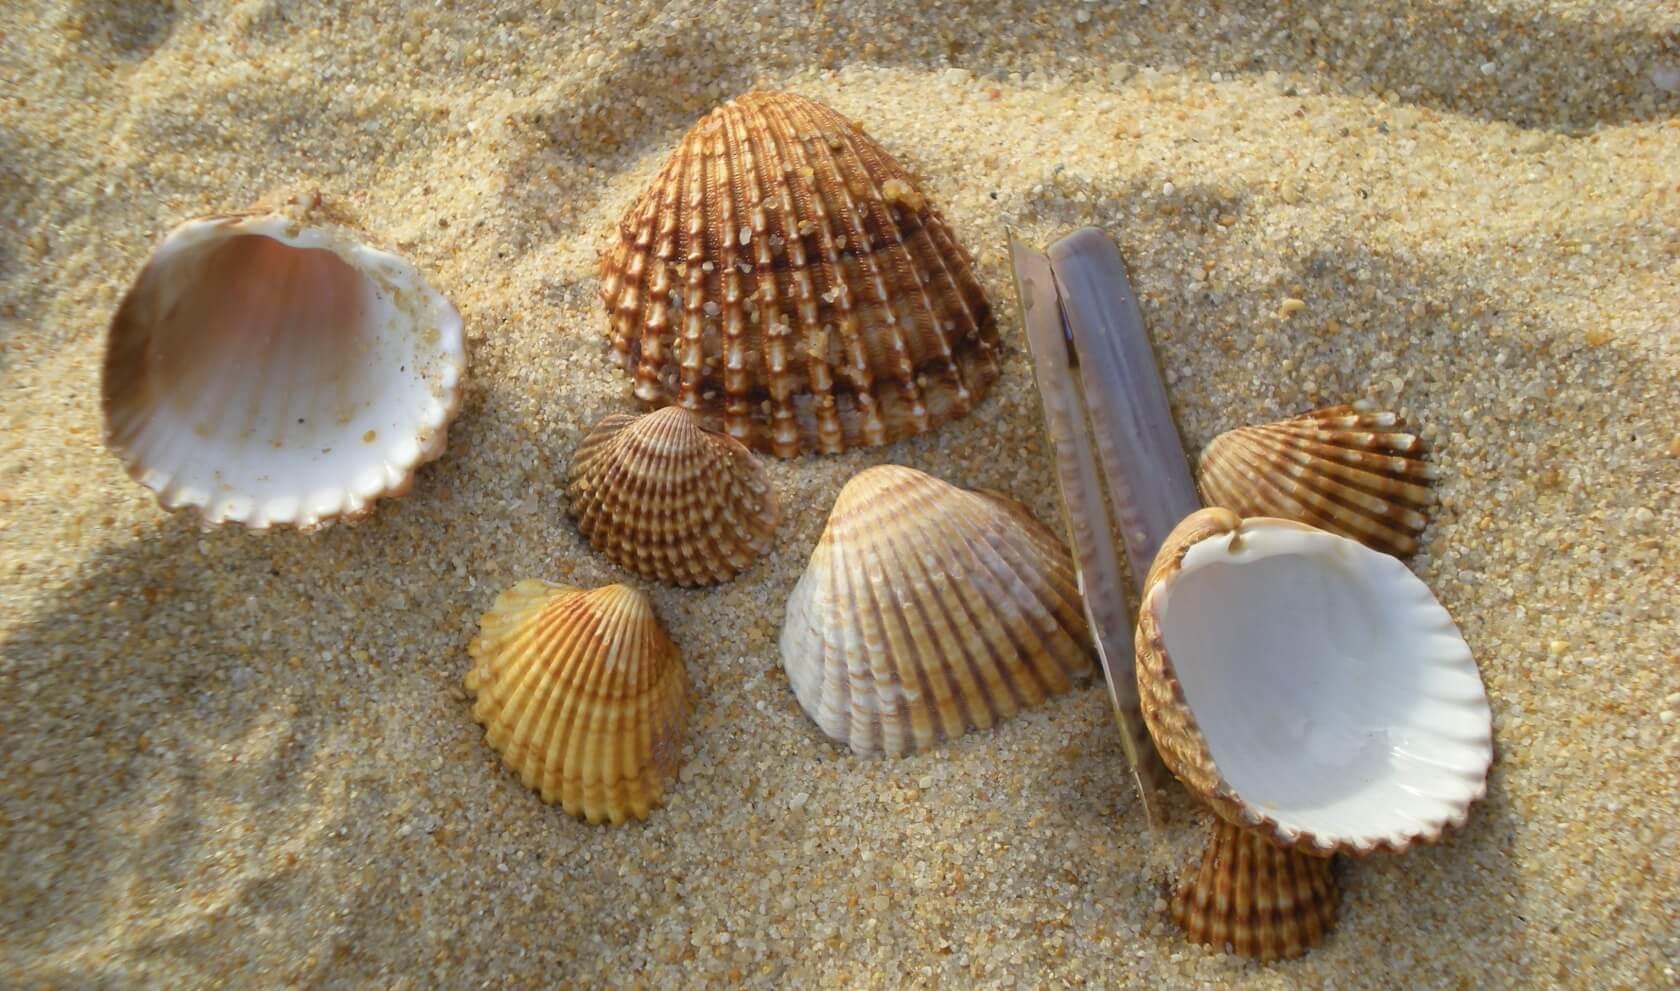 Yoga Urlaub - Muscheln am Strand